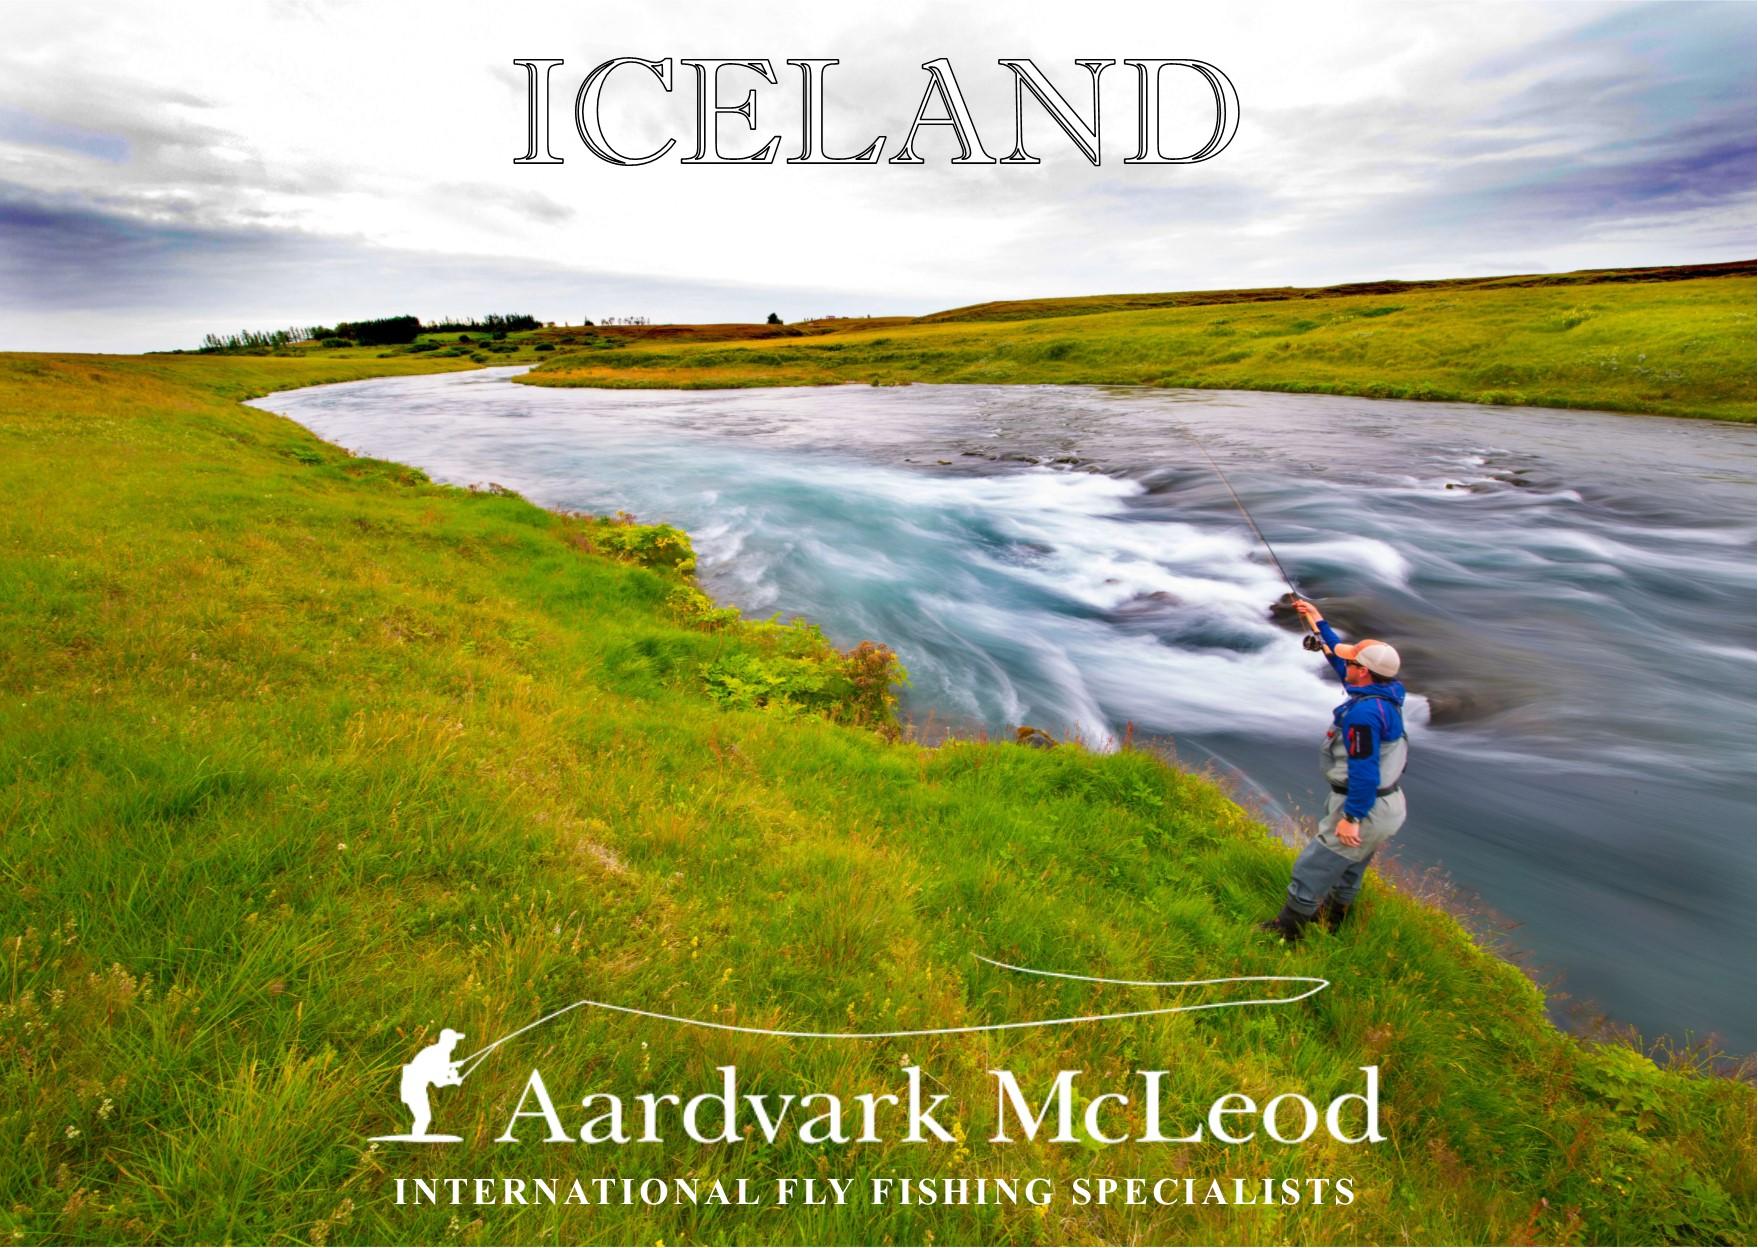 Aardvark McLeod Iceland Brochure, Fly Fishing Iceland, Salmon fishing Iceland, Trout fishing Iceland